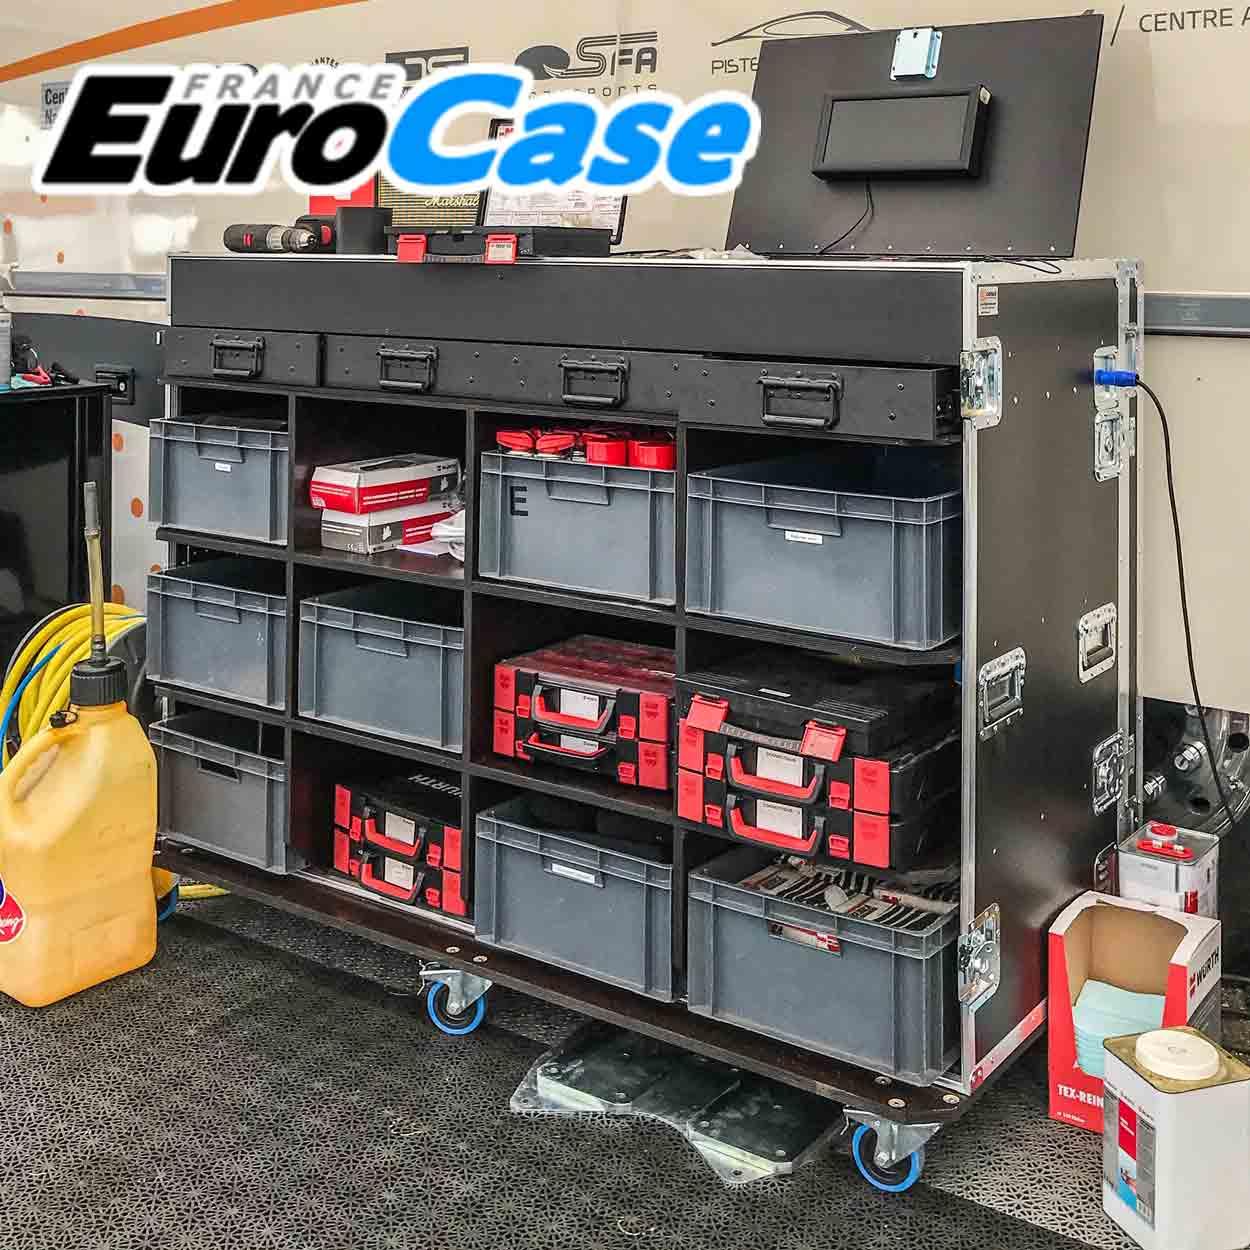 flycase motosport eurocase